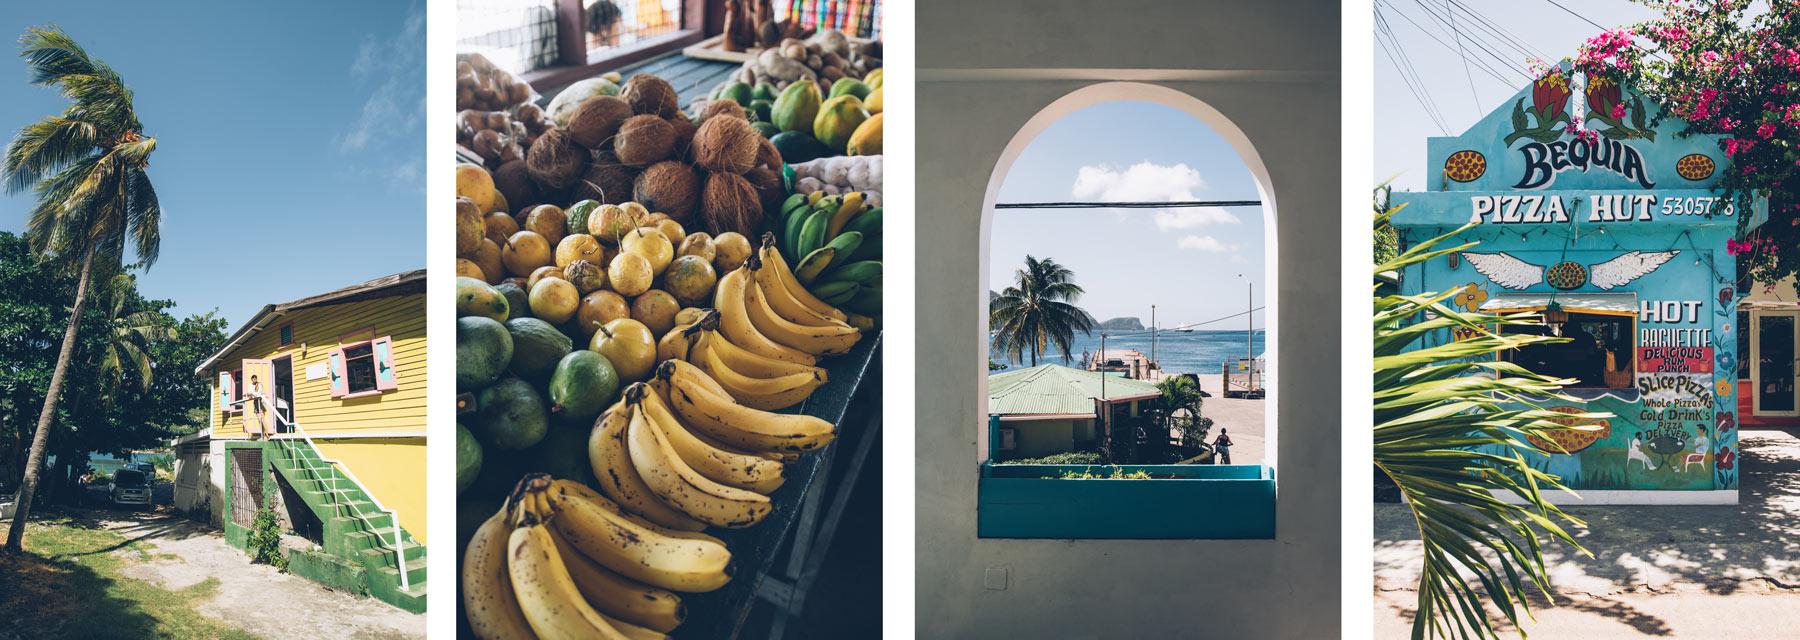 Ile de Bequia, Grenadines